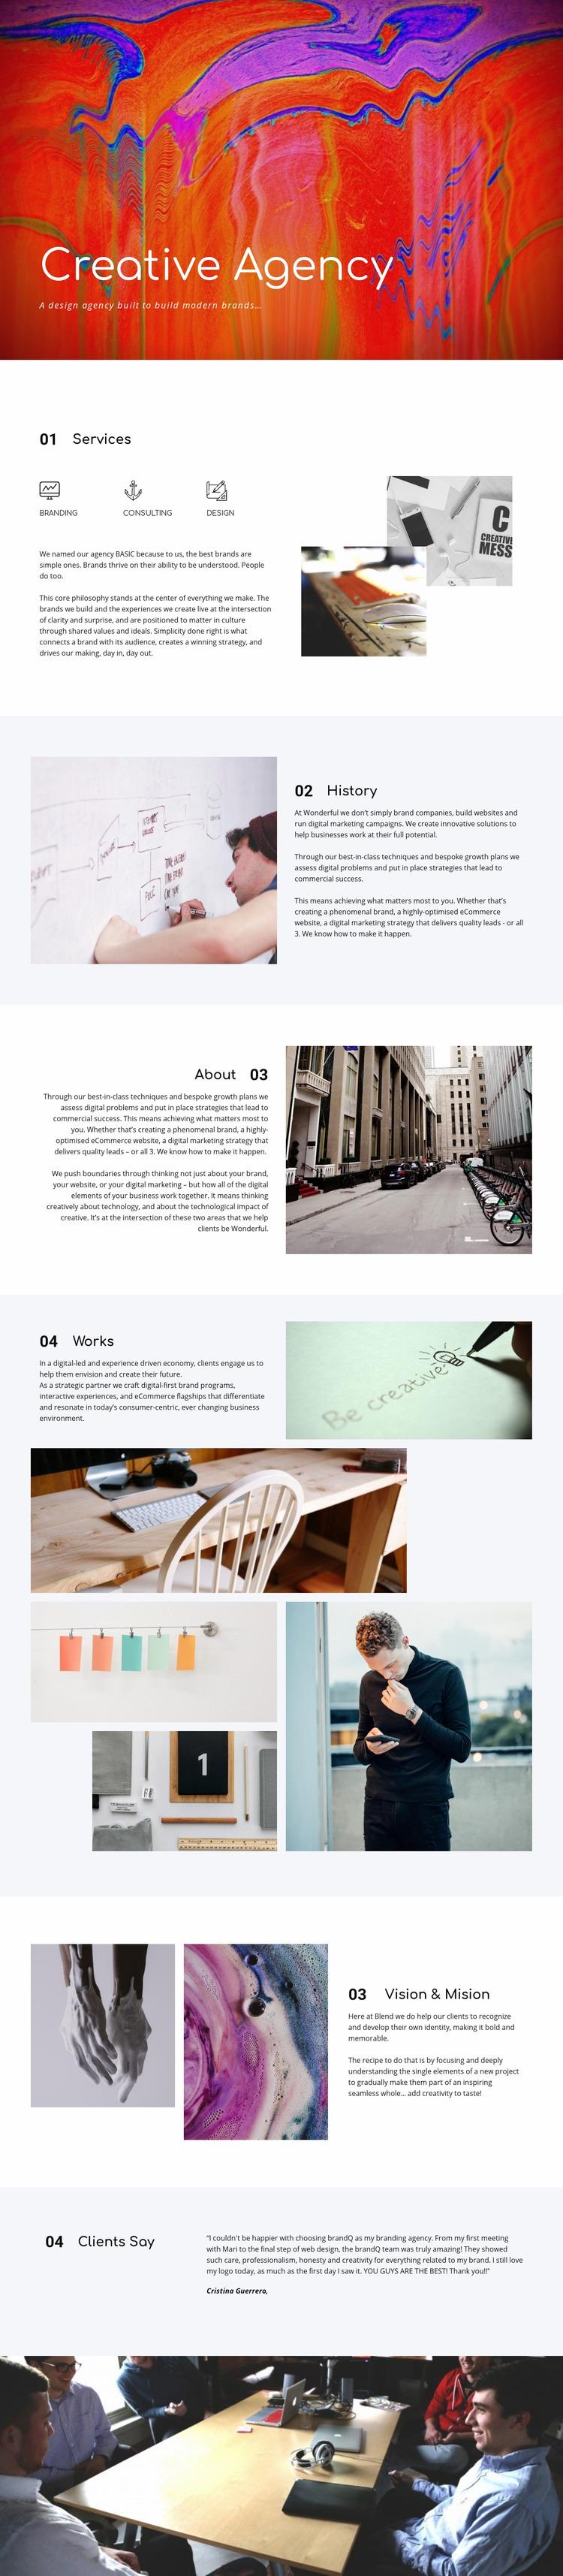 Creative gallery Website Maker